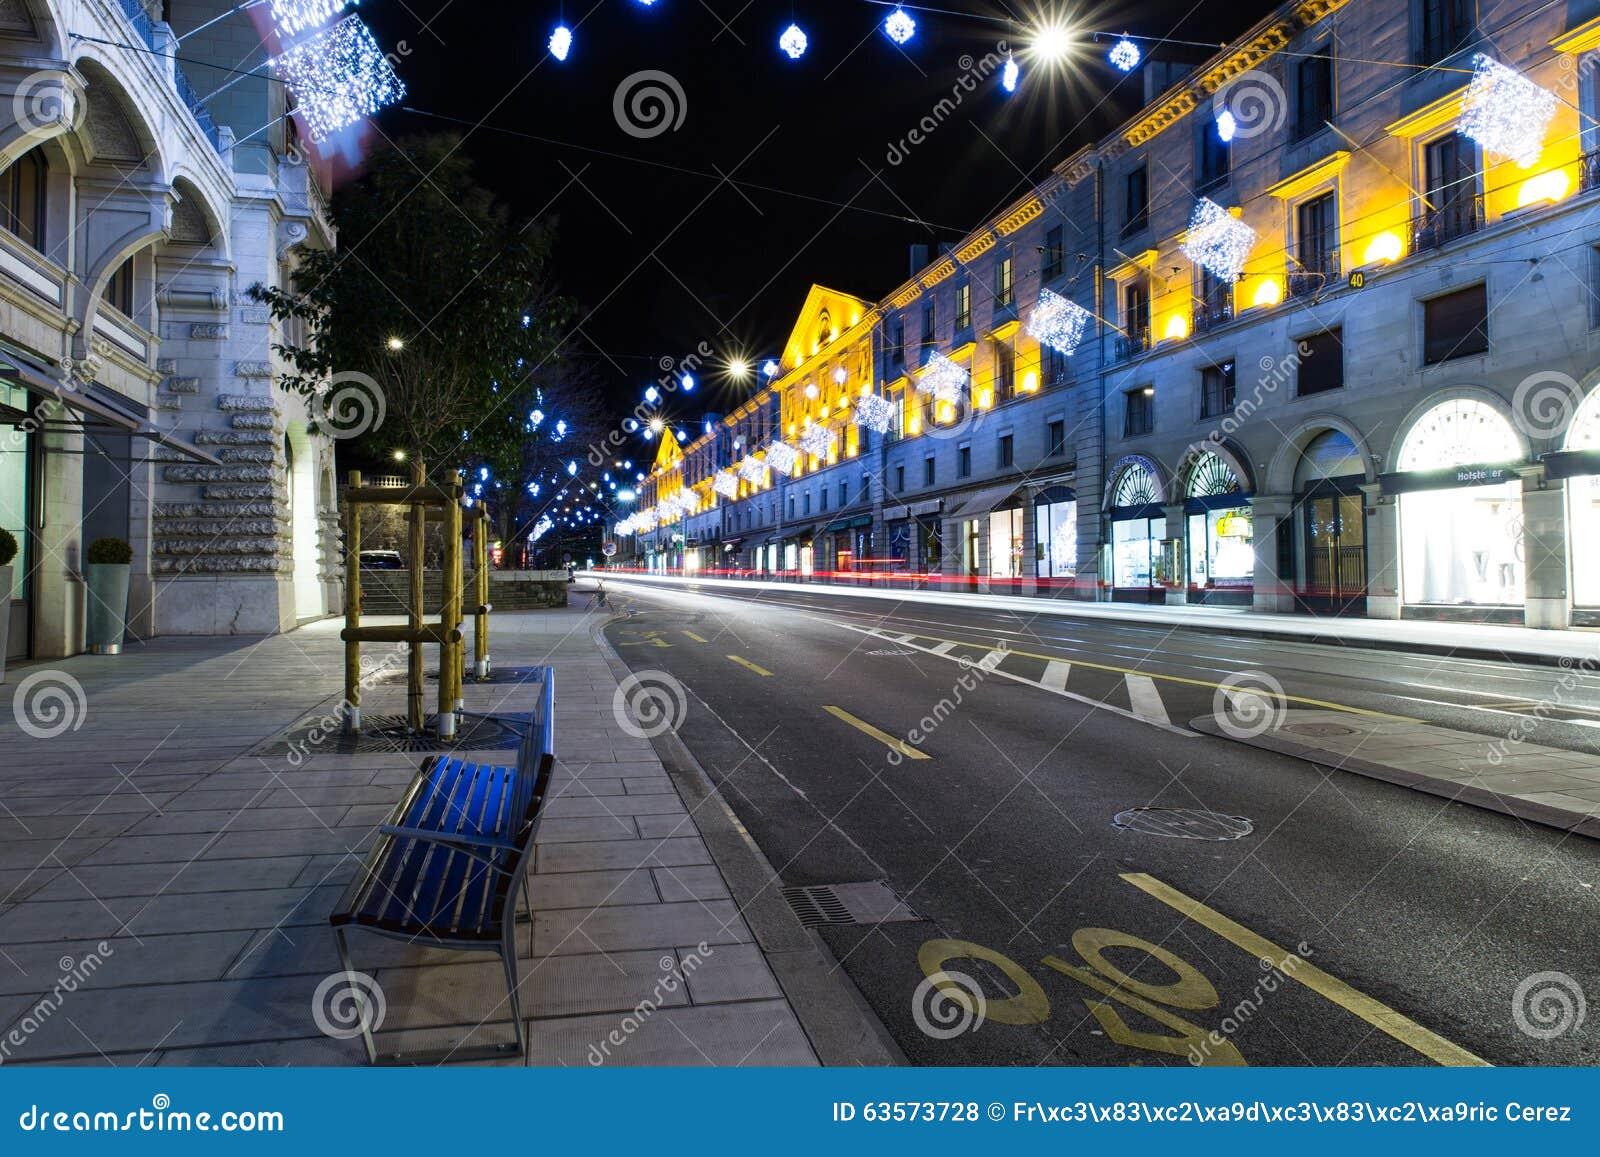 #C0A50B Corraterie Street At Night Editorial Stock Photo 5545 decorations noel geneve 1300x957 px @ aertt.com